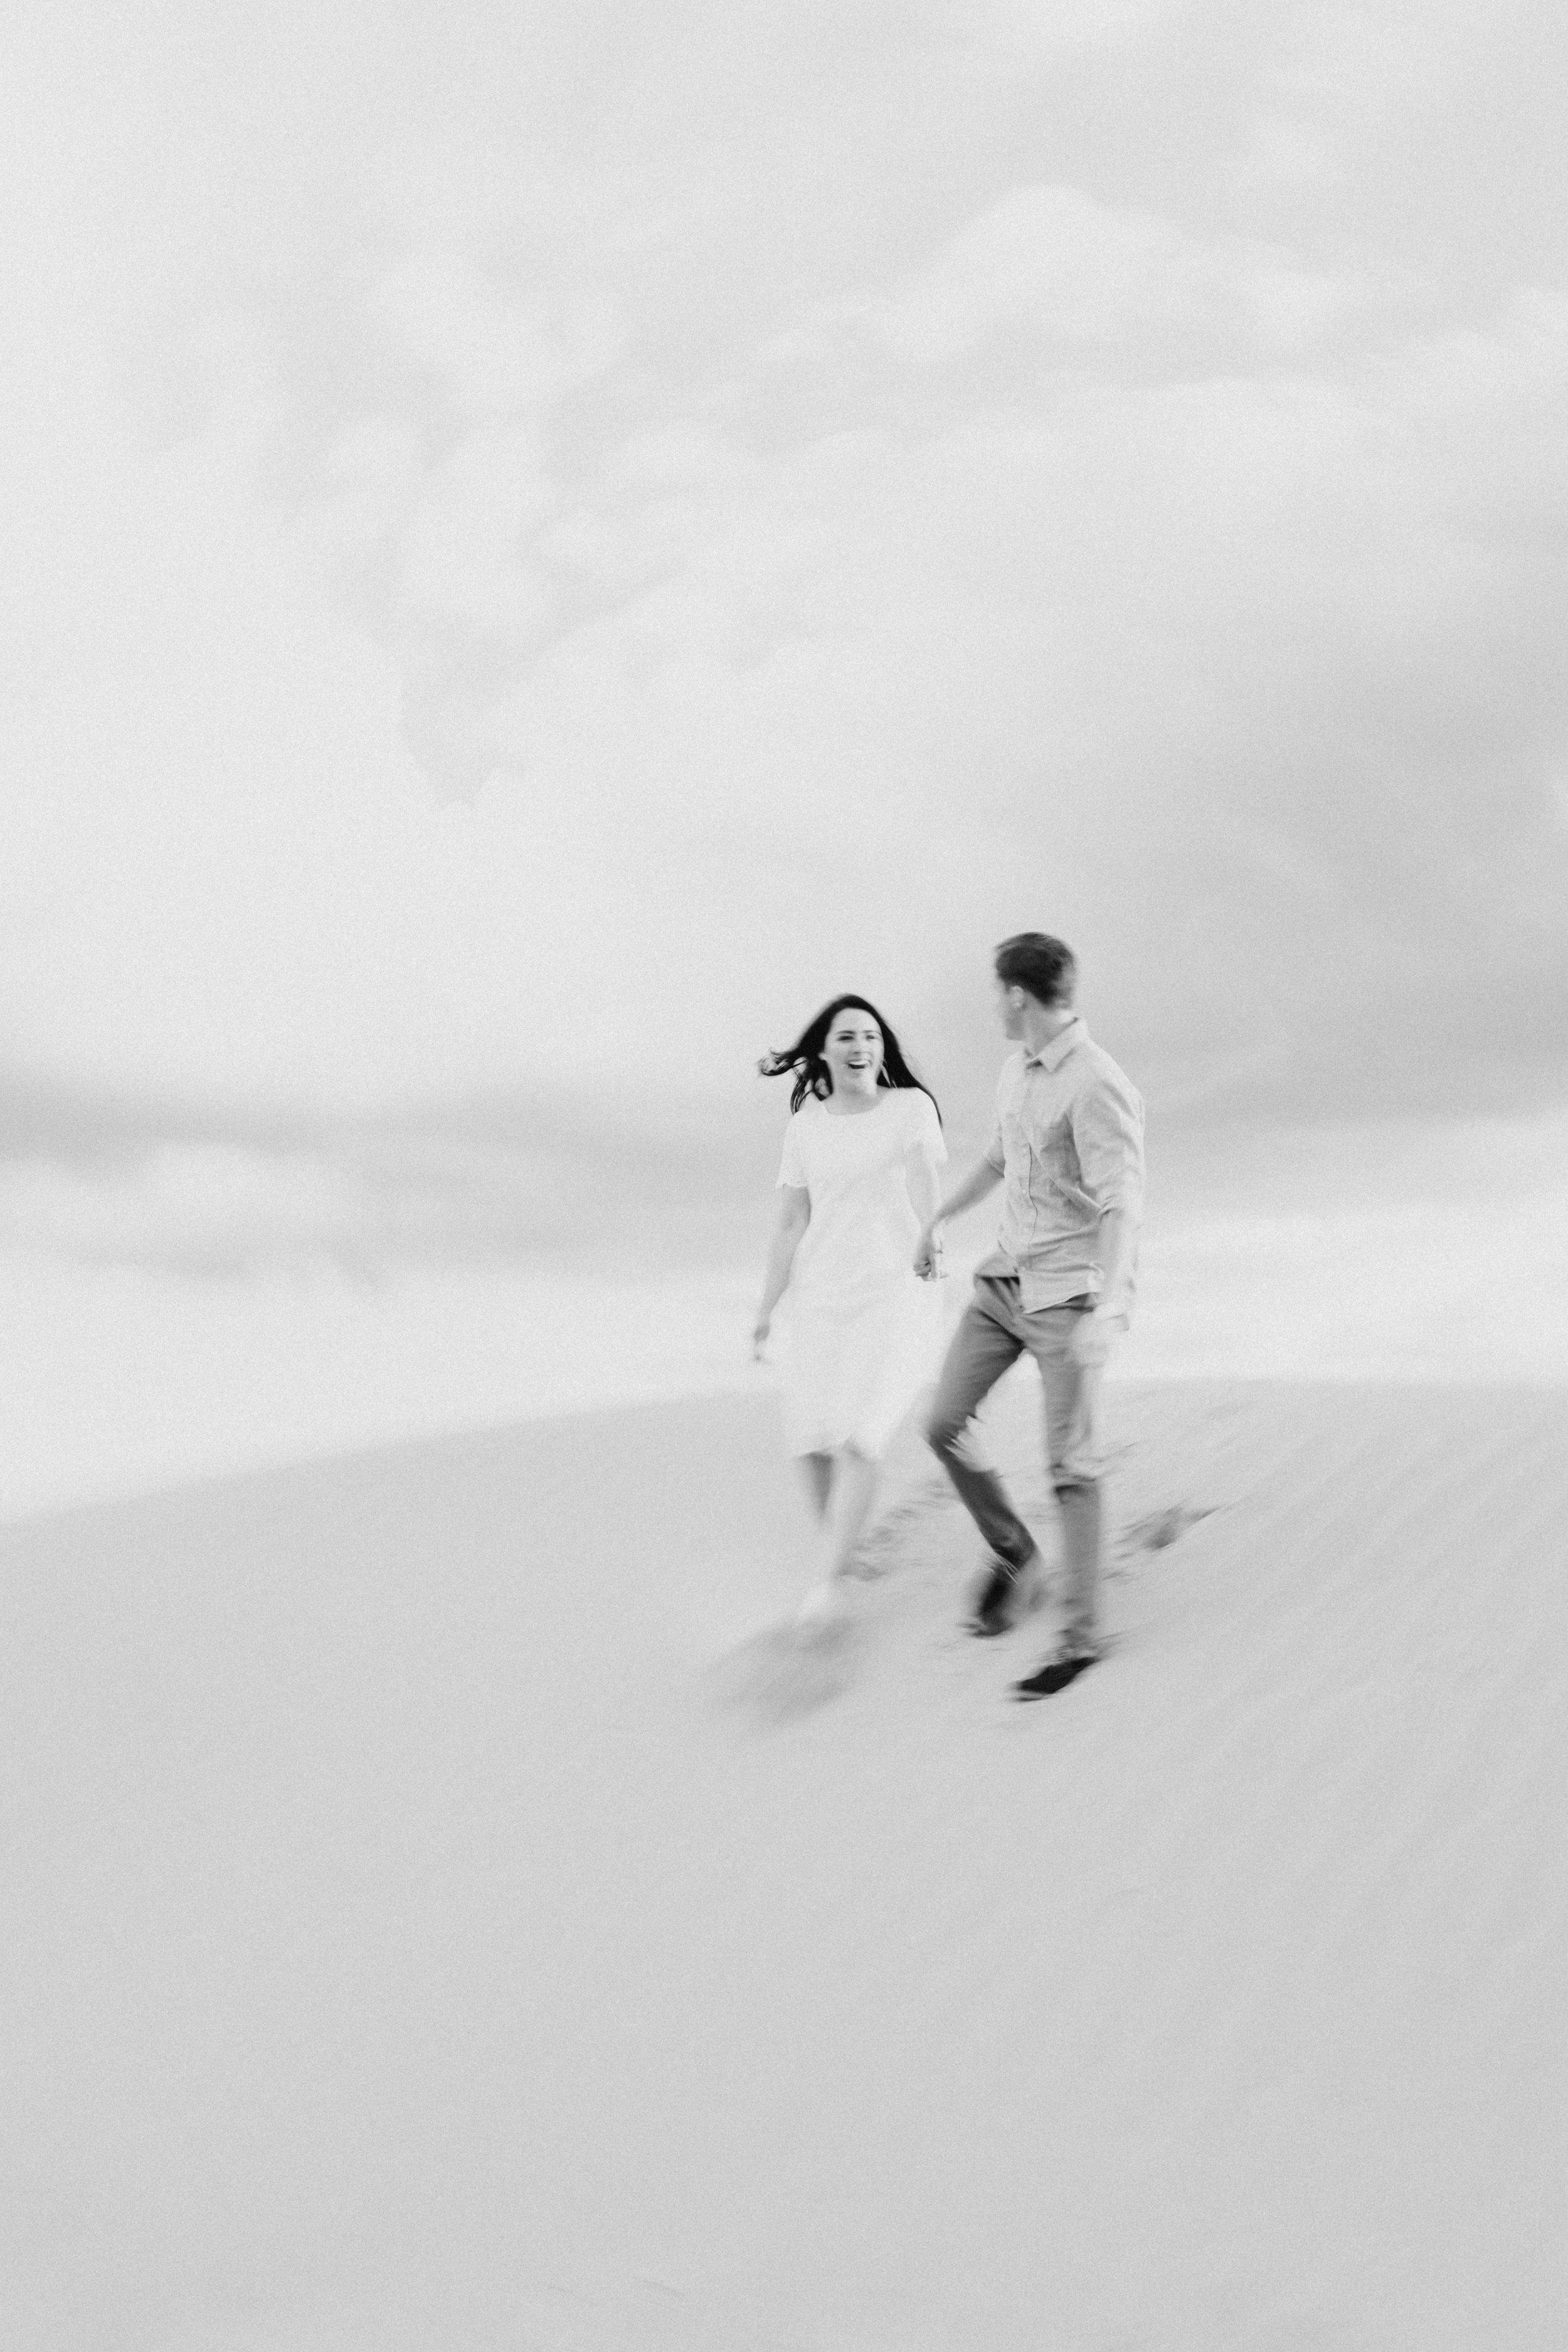 little-sahara-recreation-area-elopement-engagement-wedding-photography-michael-cozzens-47.jpg